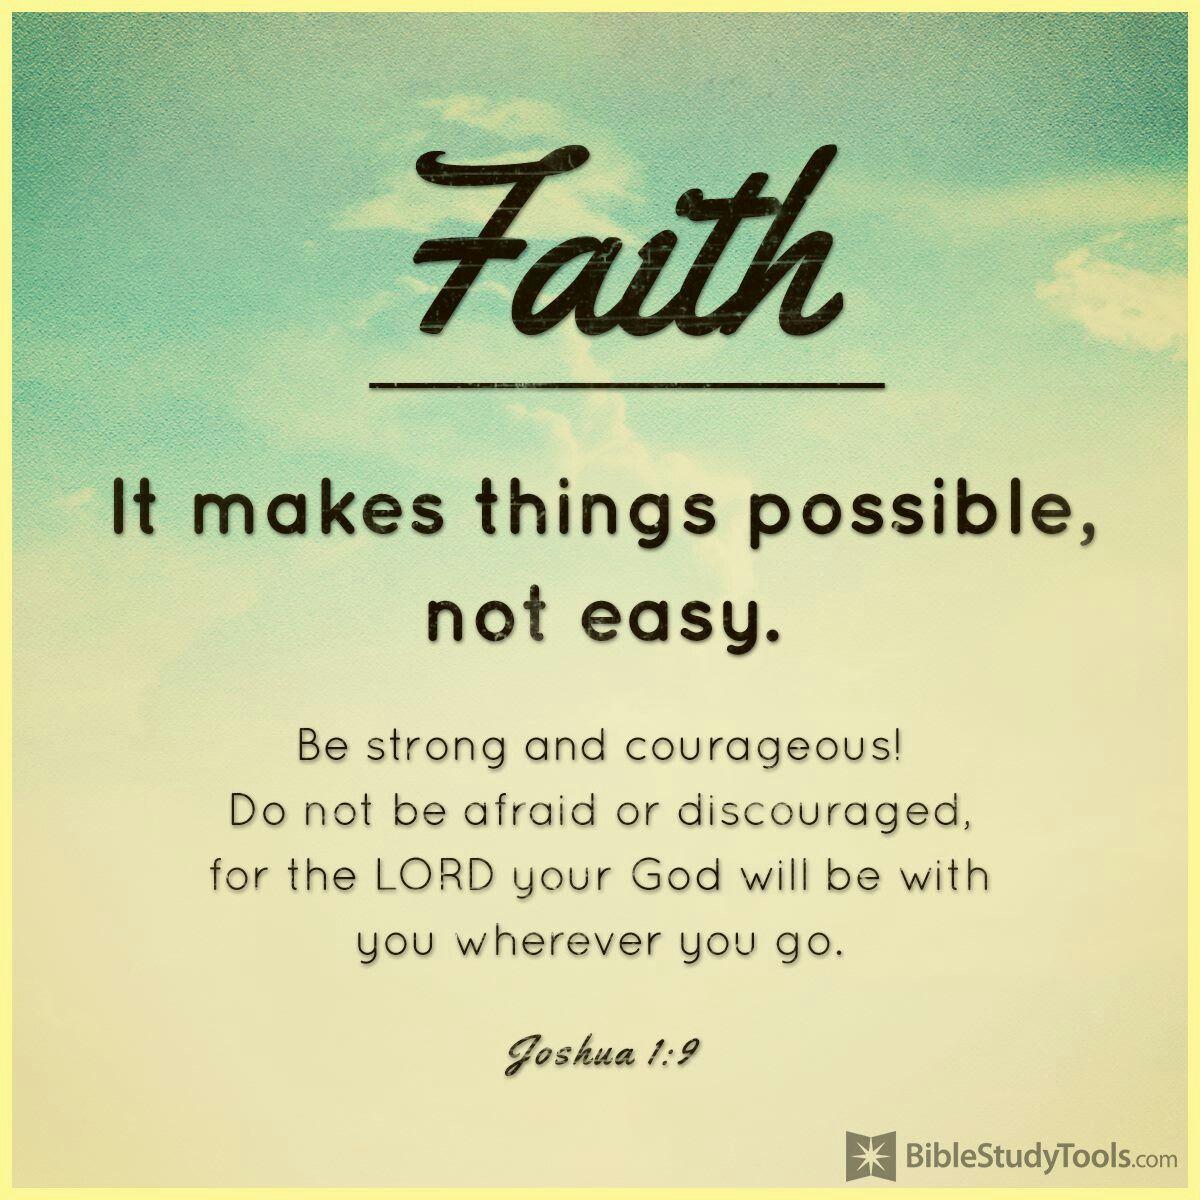 Christian Inspirational Quotes Life Pinnithya Samson On Bible Verses  Pinterest  Verses And Bible